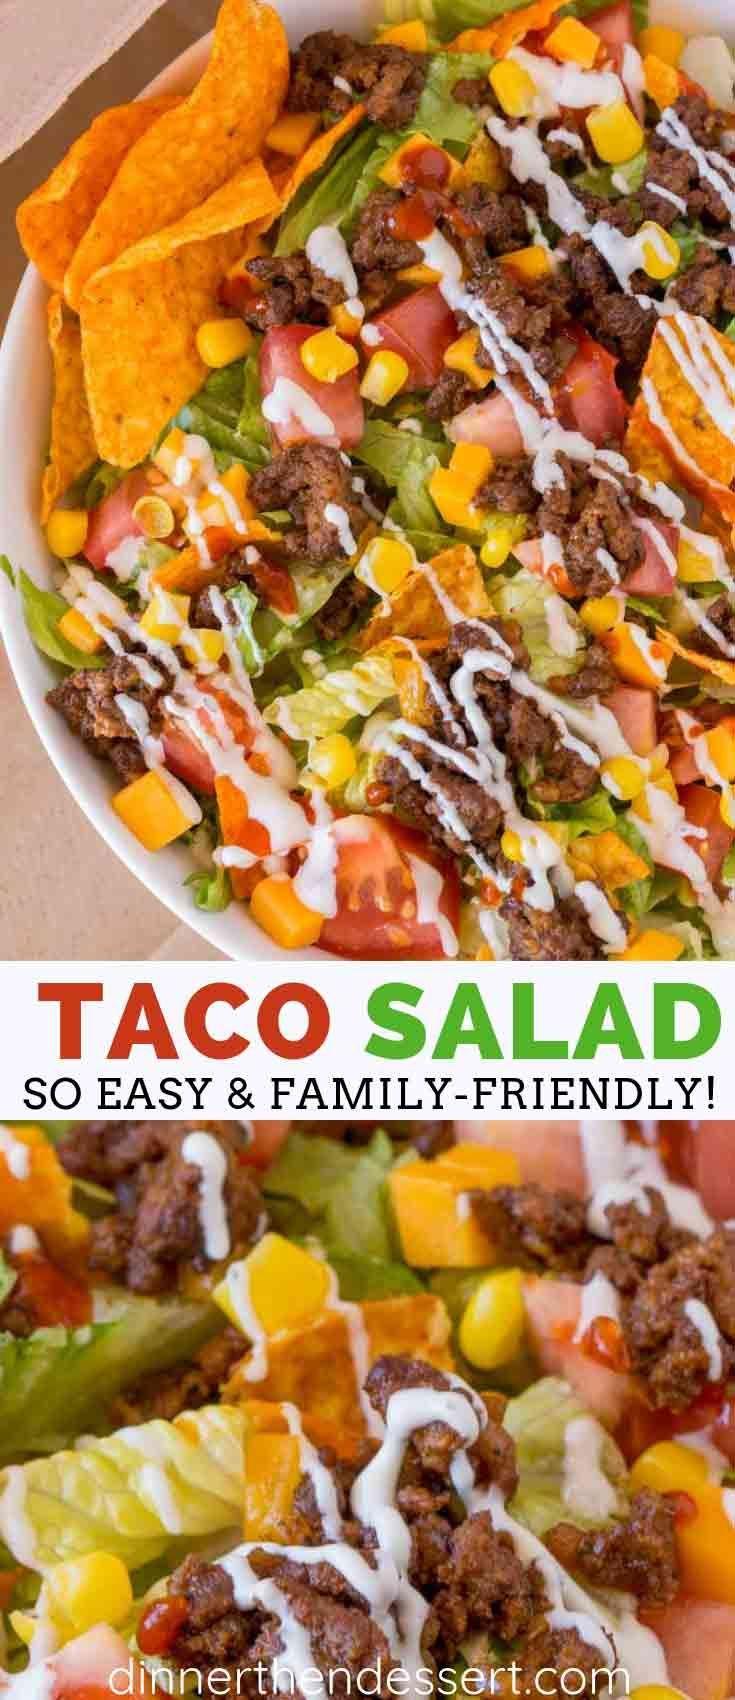 Easy Taco Salad - Dinner, then Dessert